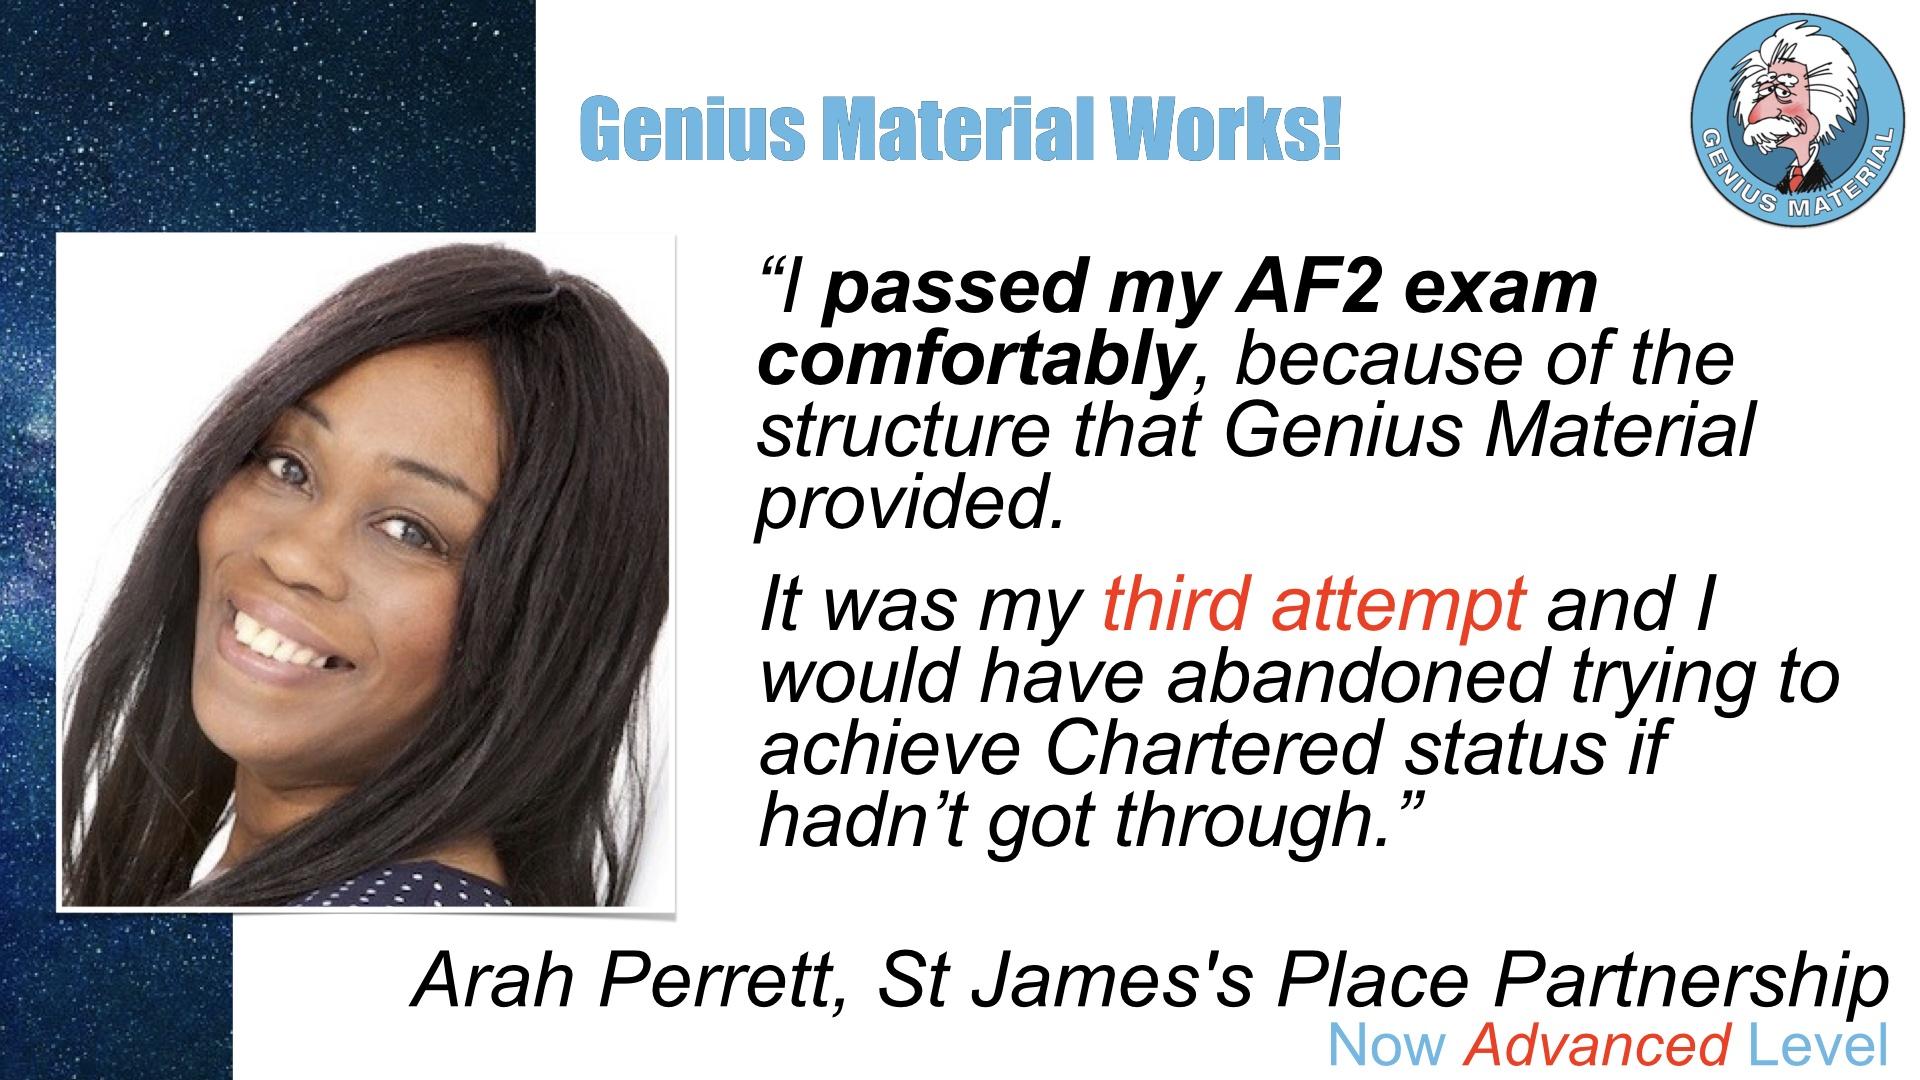 Arah Perrett is Genius Material